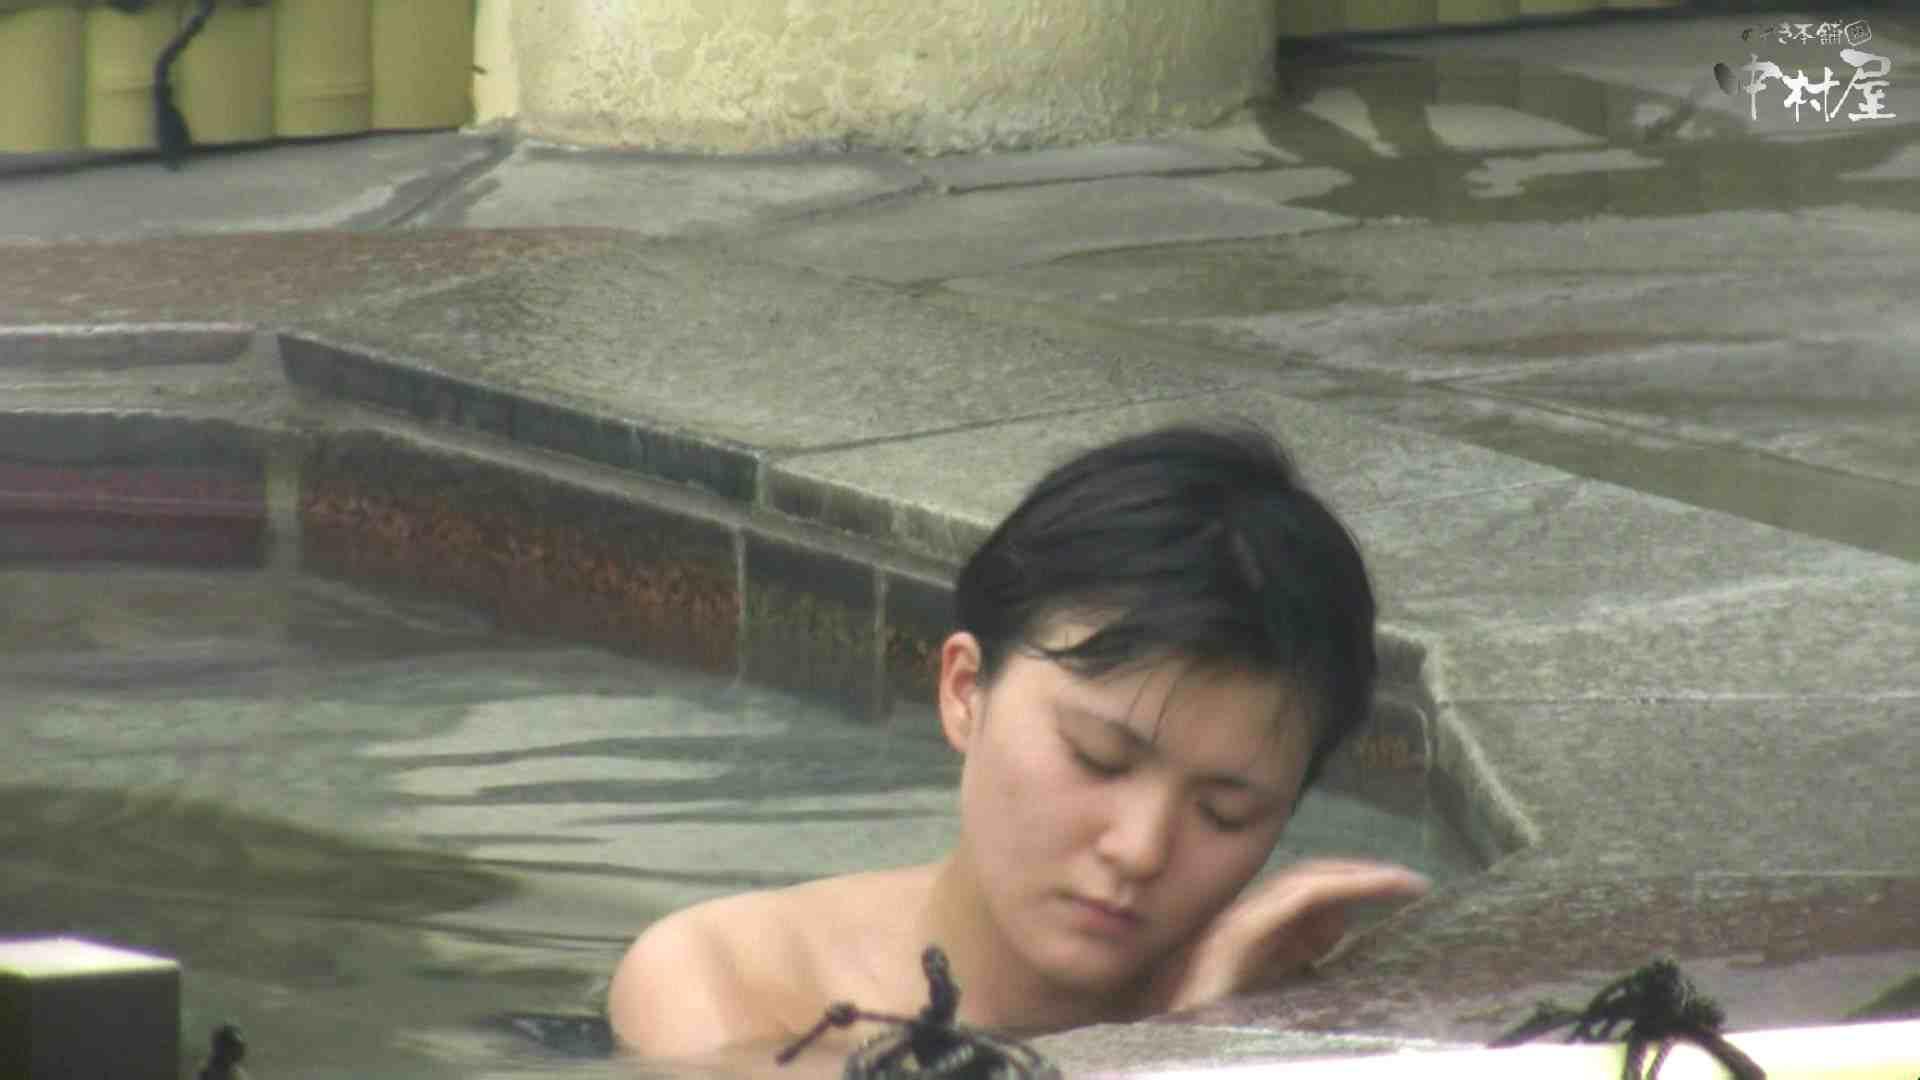 Aquaな露天風呂Vol.894 0  67連発 20